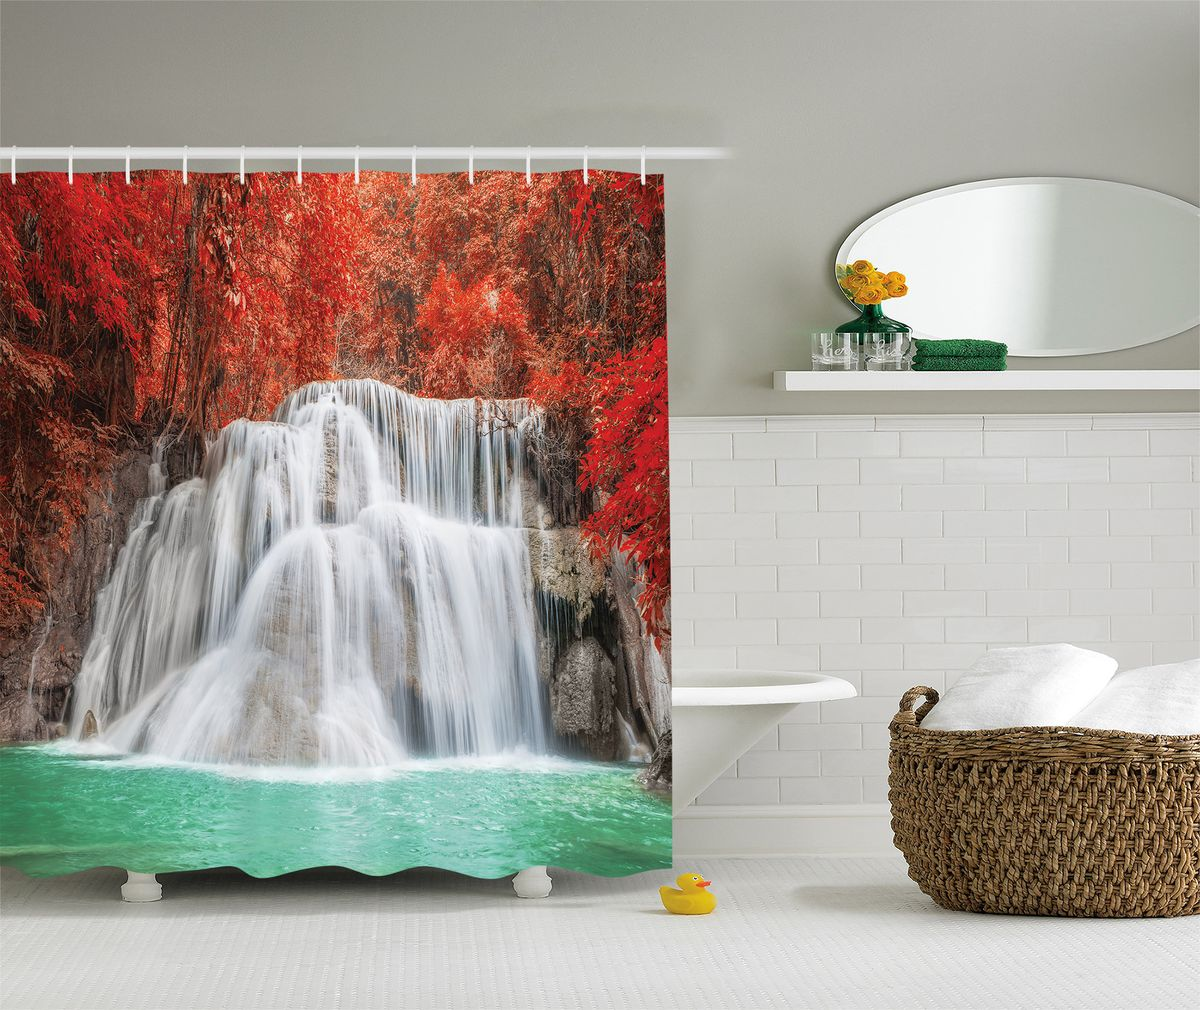 Штора для ванной комнаты Magic Lady Водопад в красном лесу, 180 х 200 см